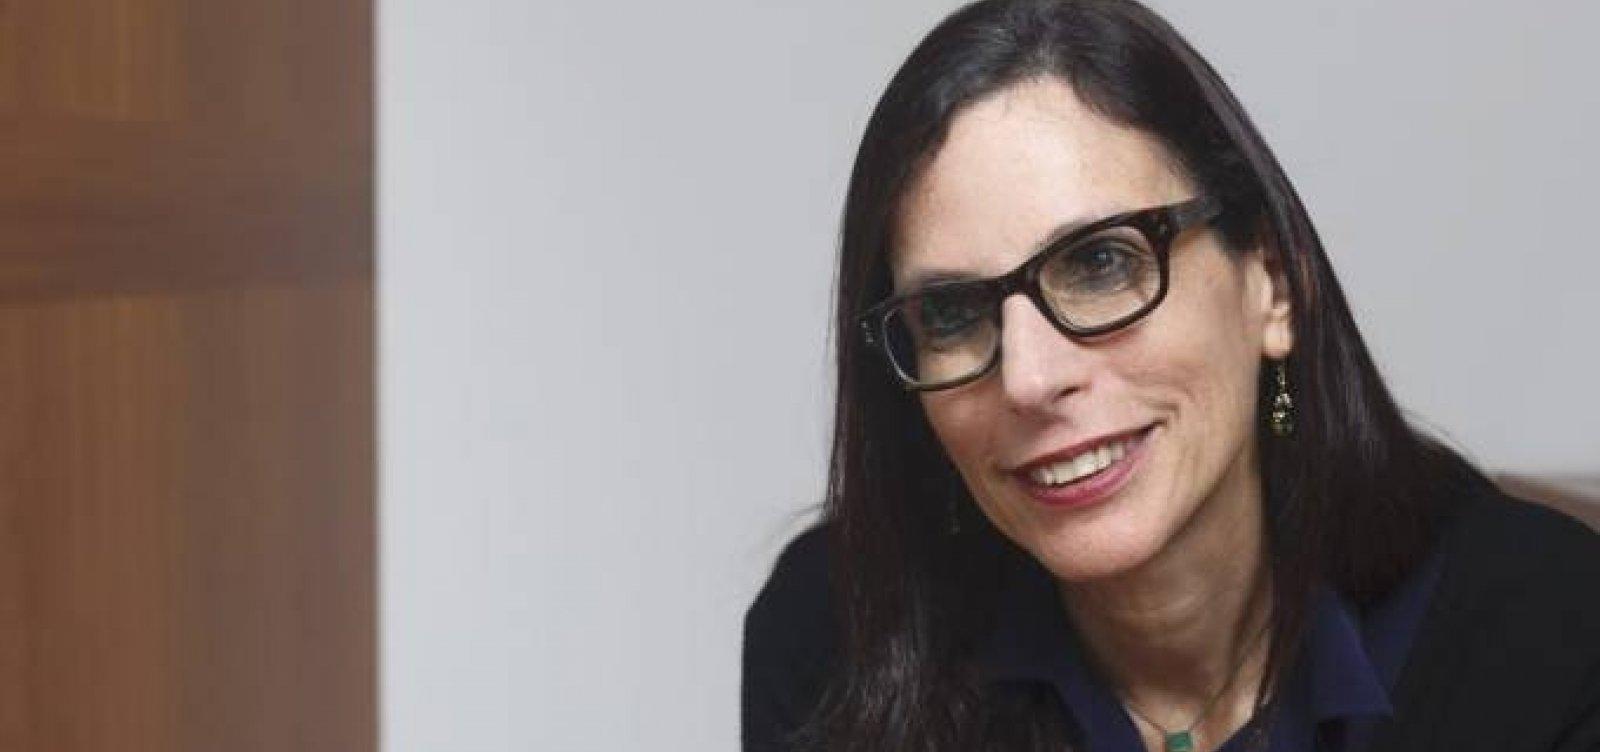 ['Nunca fomos tolerantes', diz historiadora LiliaMoritz sobre autoritarismo brasileiro]